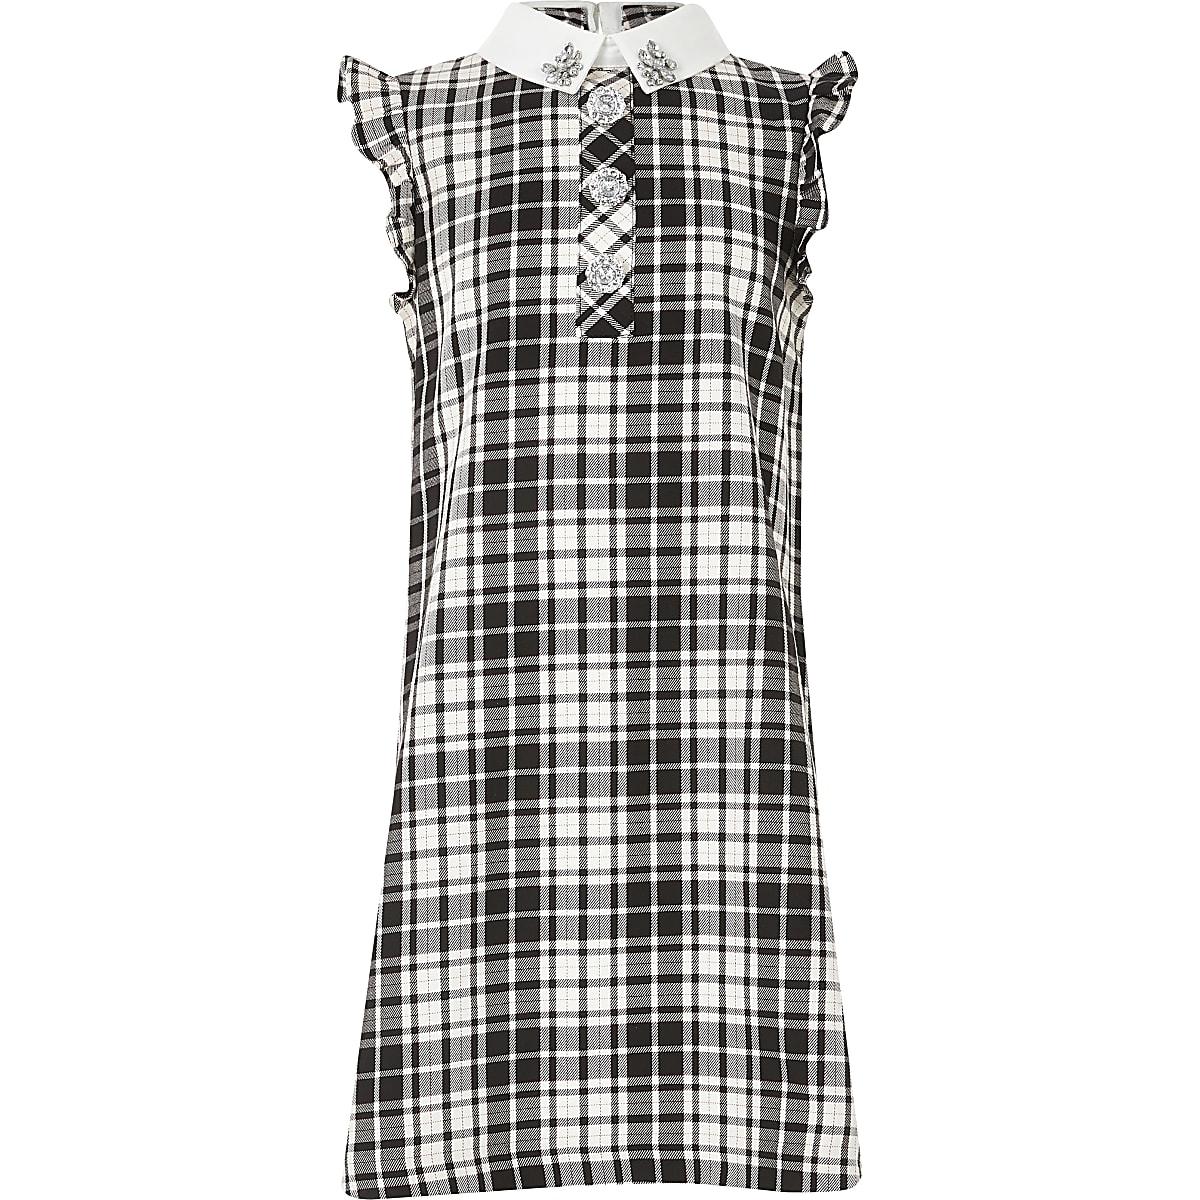 Girls black monochrome check shirt dress